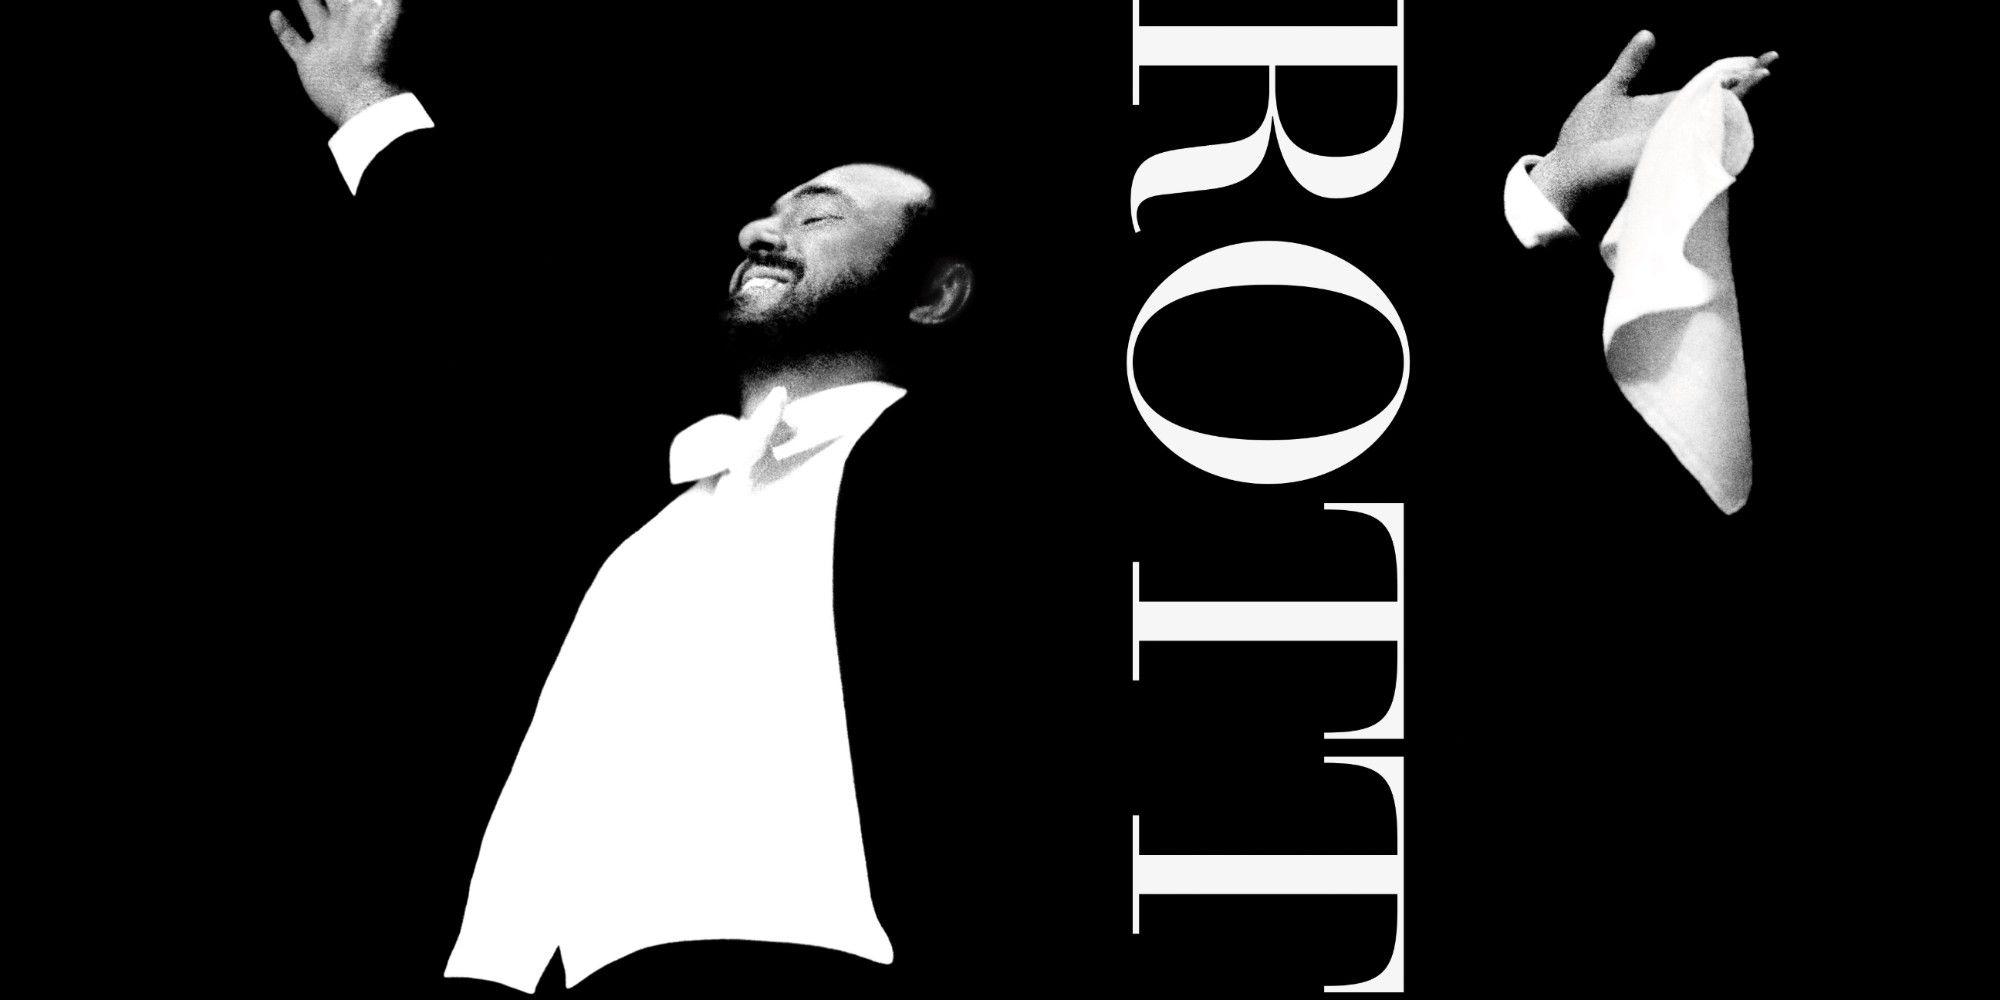 Pavarotti Trailer & Poster Tease Ron Howard's Pavarotti Documentary